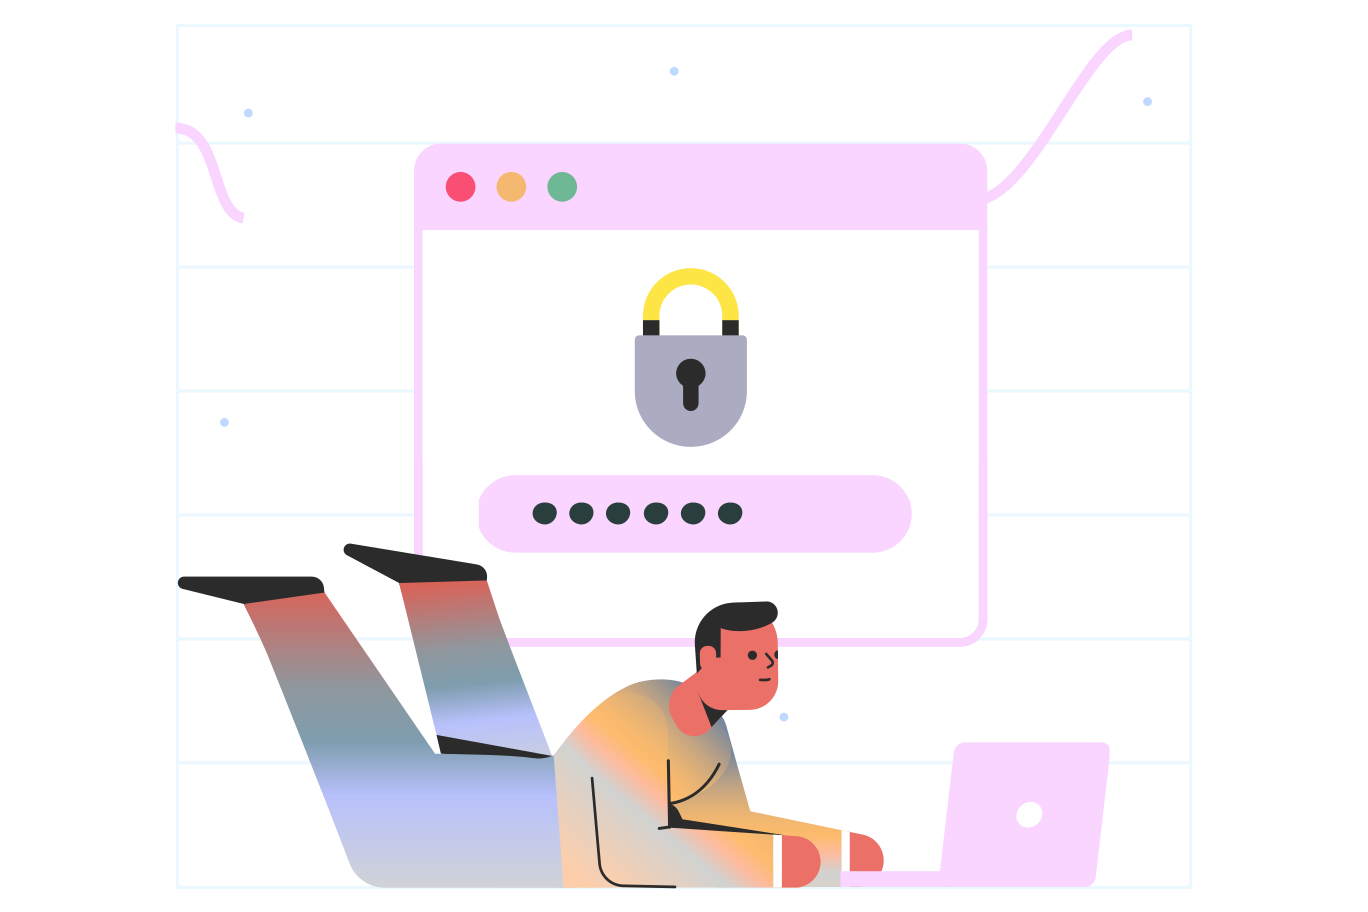 Sicheres passwort Clipart-Grafik als PNG, SVG